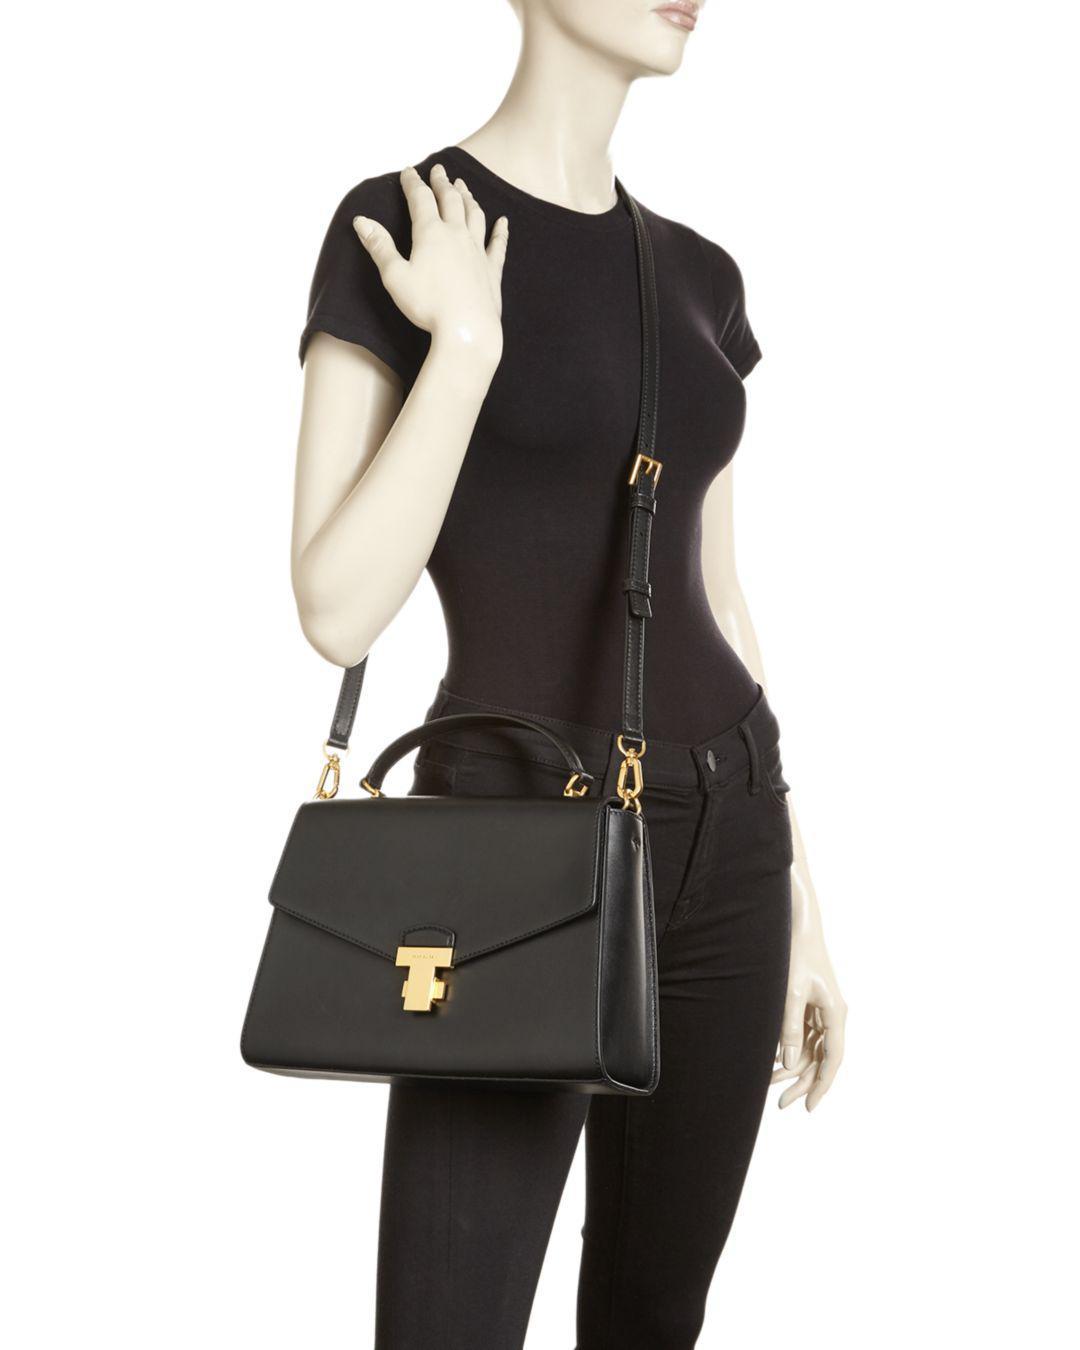 3674cb6cdb81 Lyst - Tory Burch Juliette Large Leather Satchel in Black